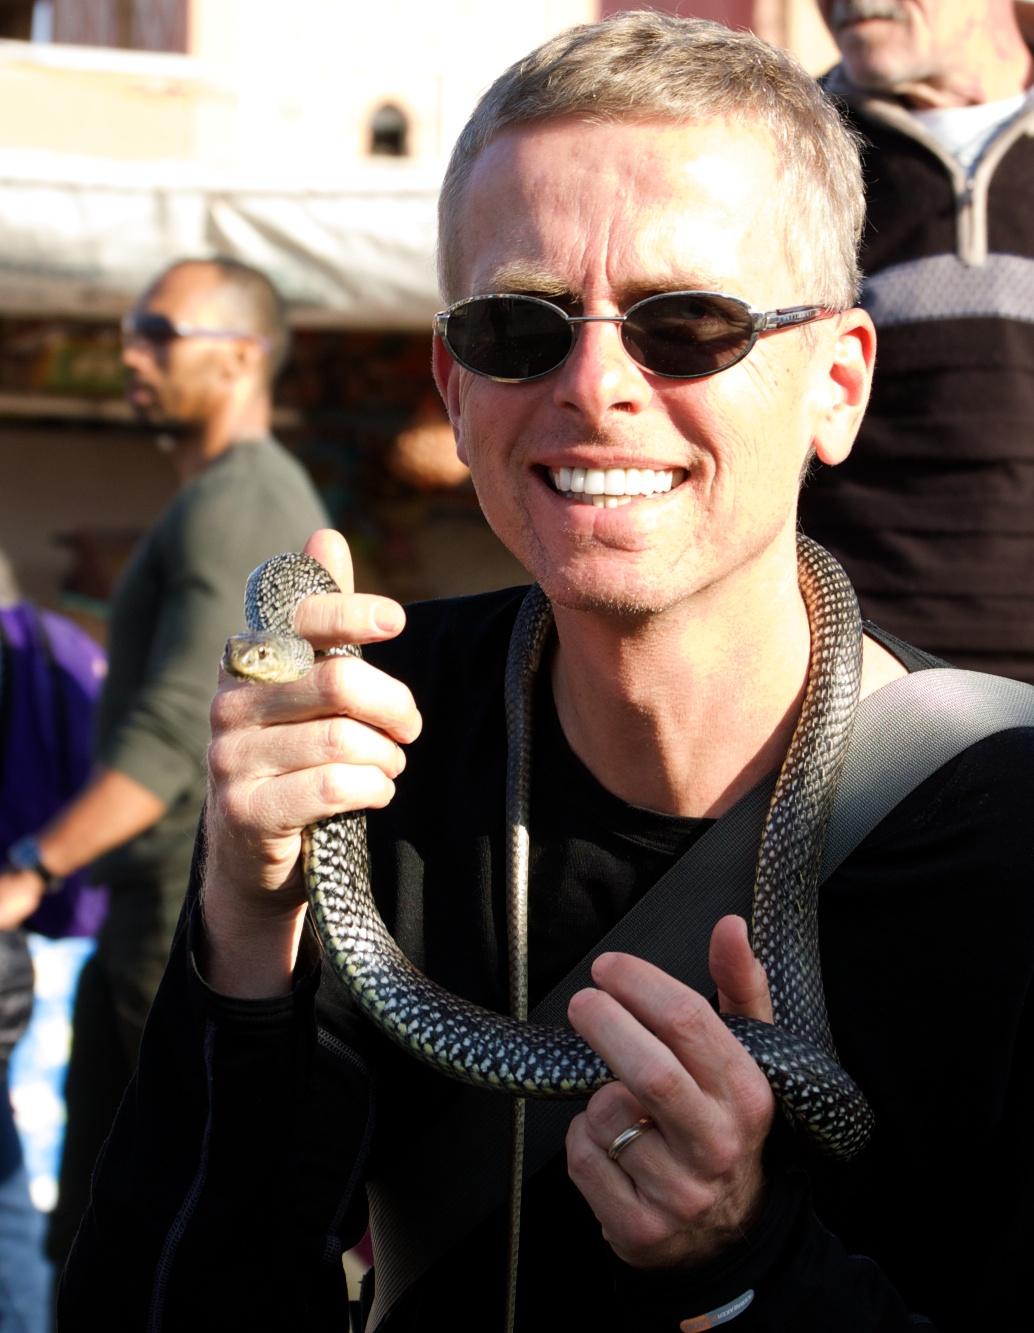 #snakesonadwayne